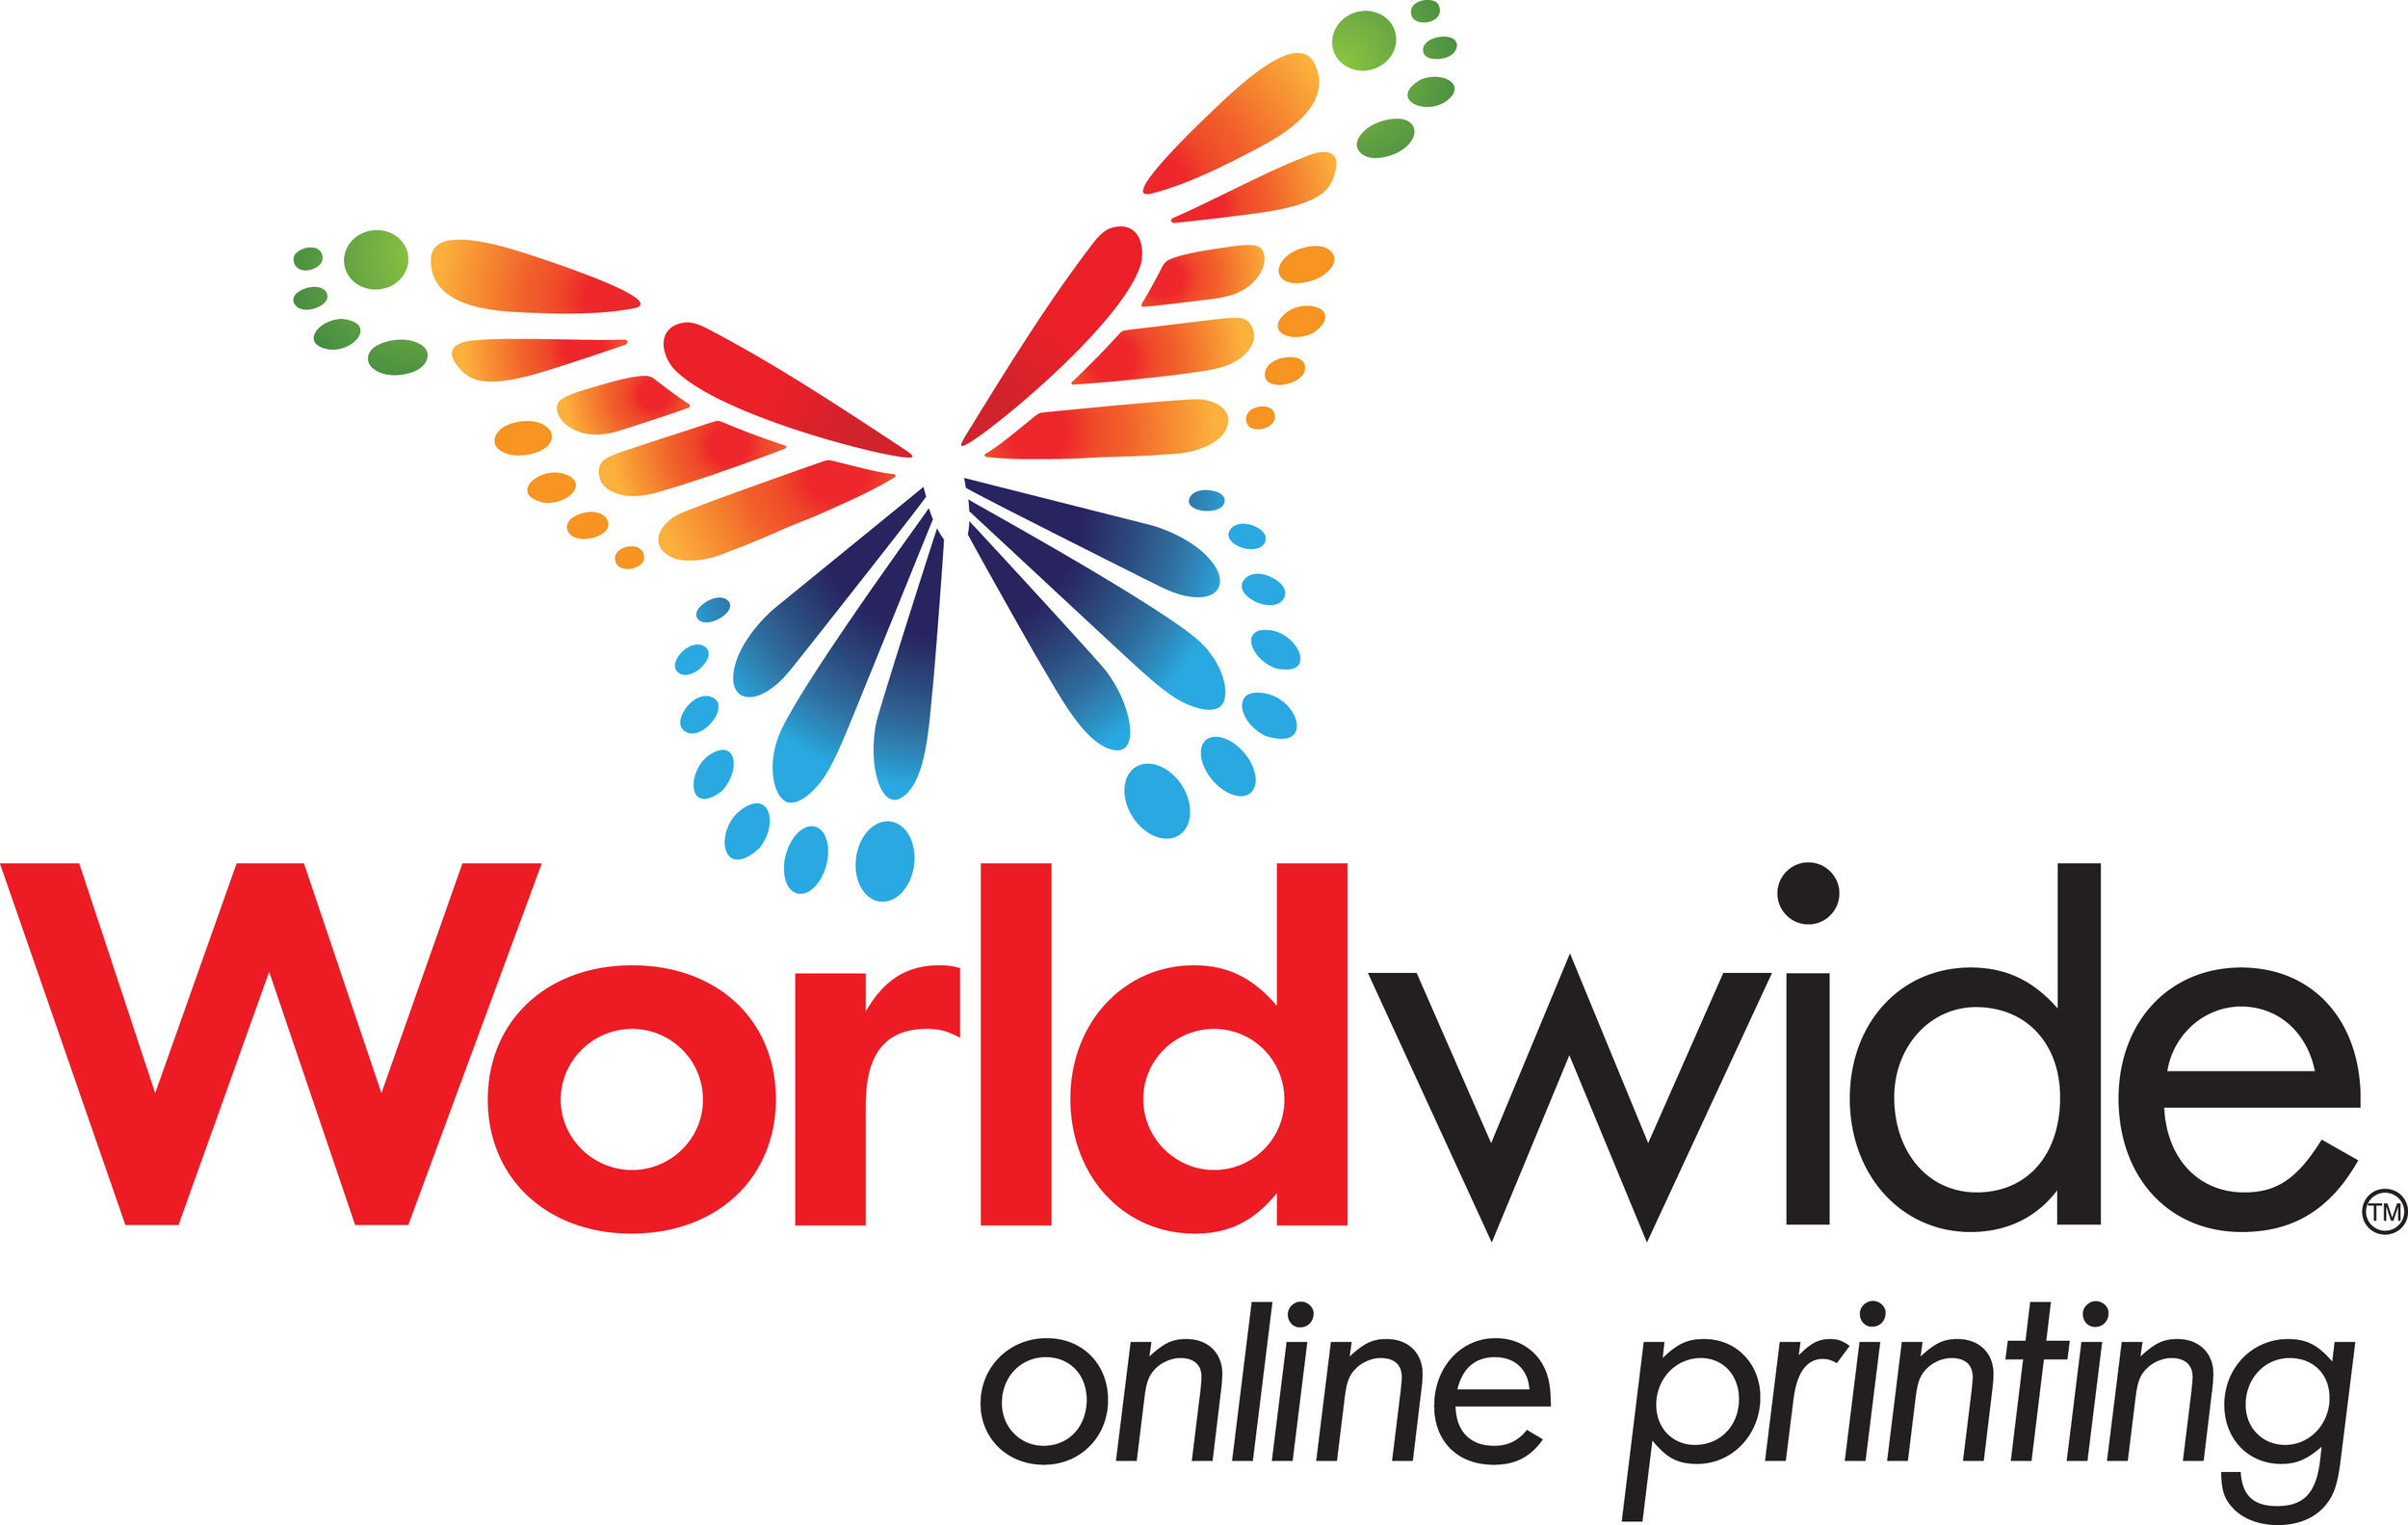 worldwide_logo_gradient_colour.jpg